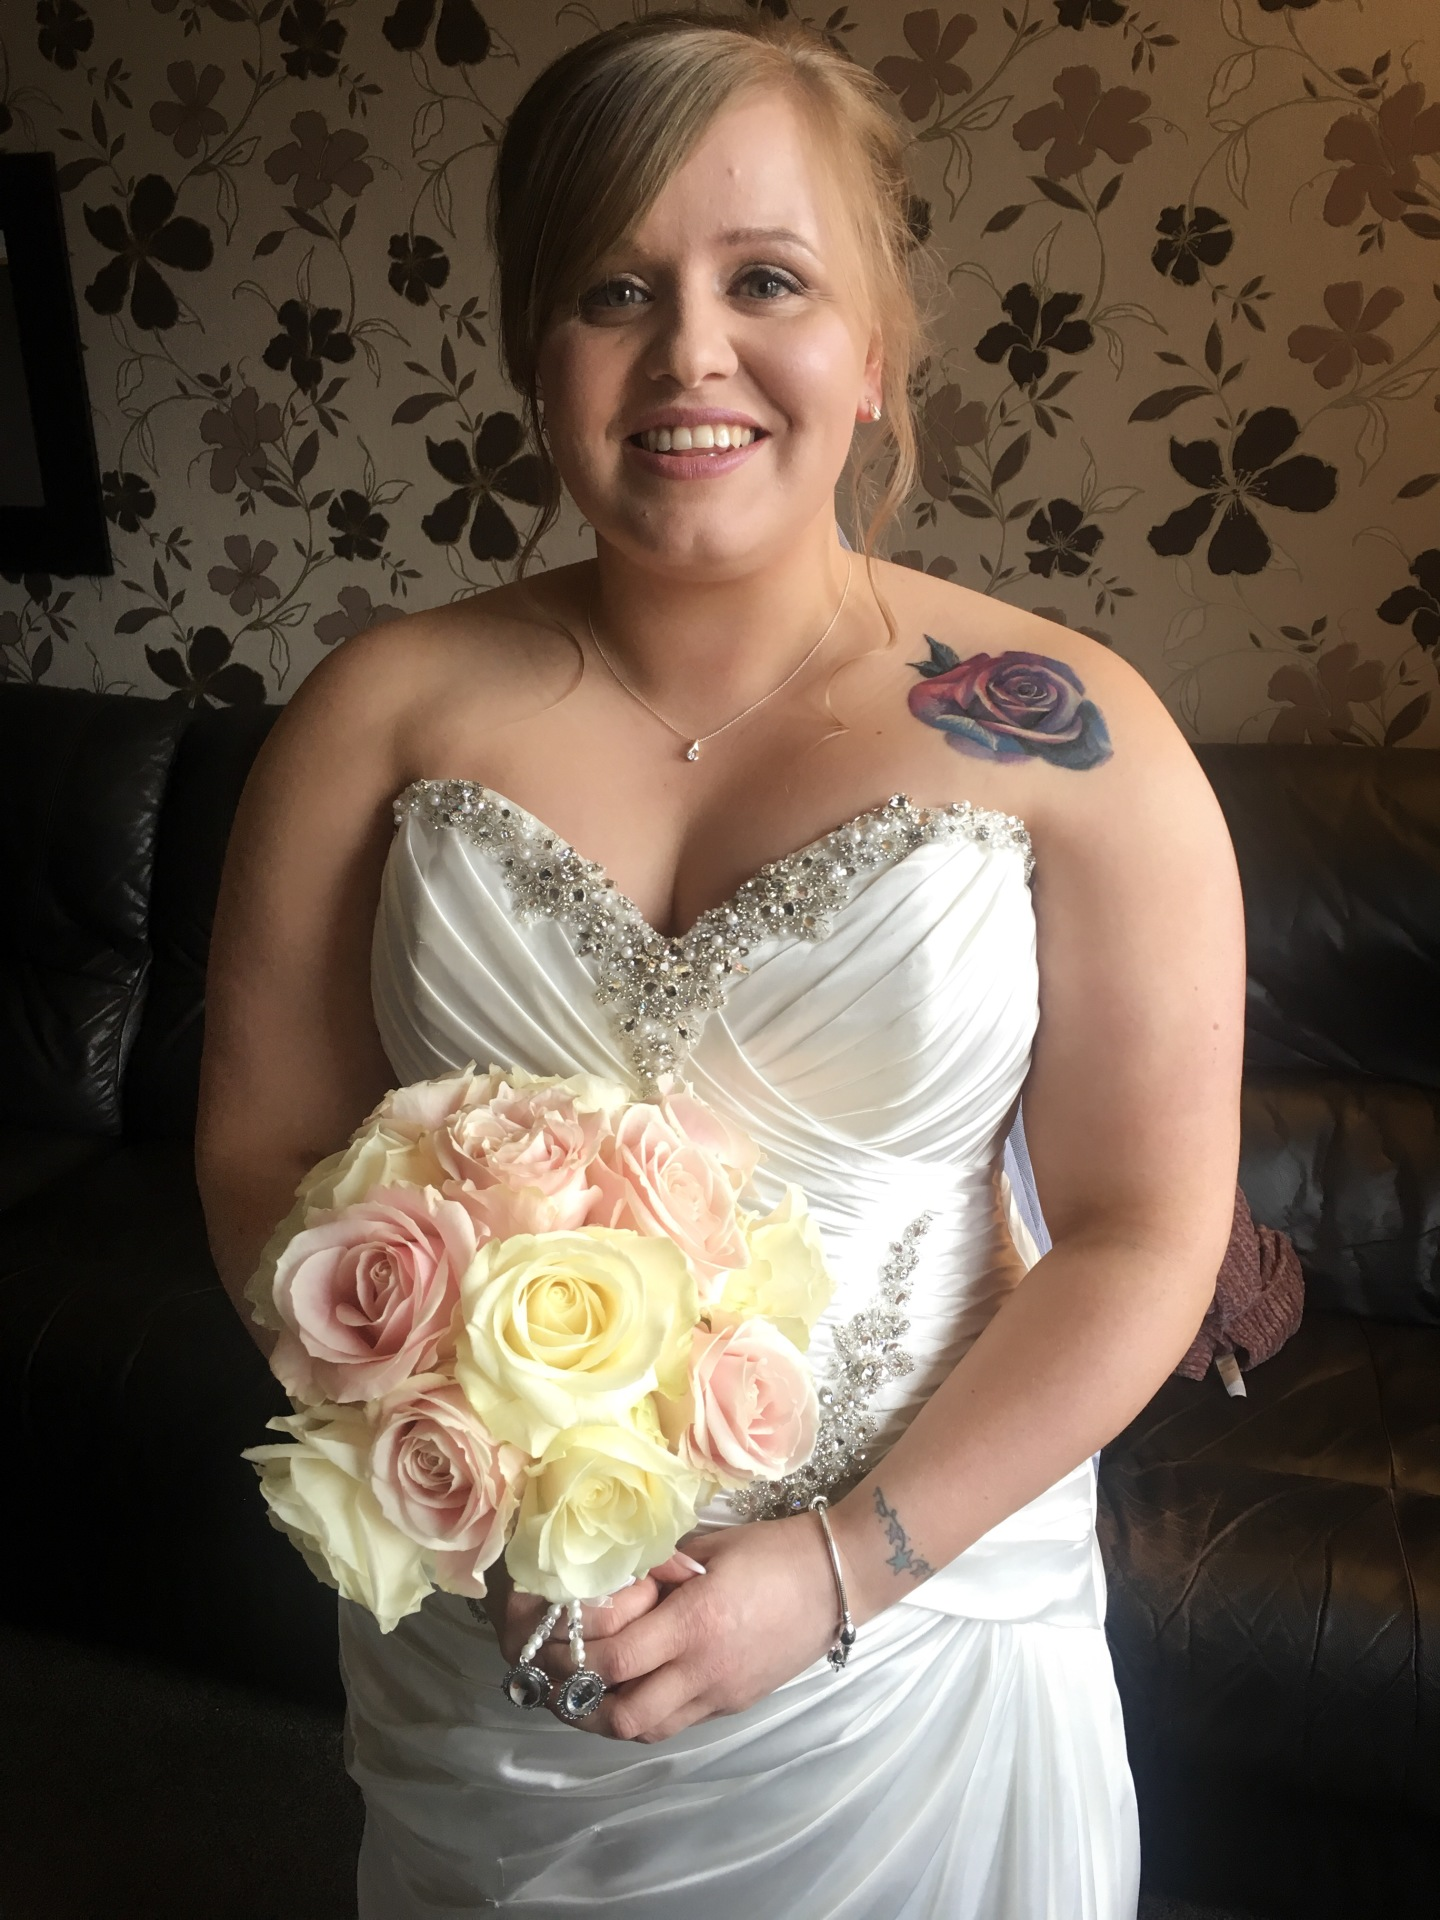 Lovely bride Kelsey